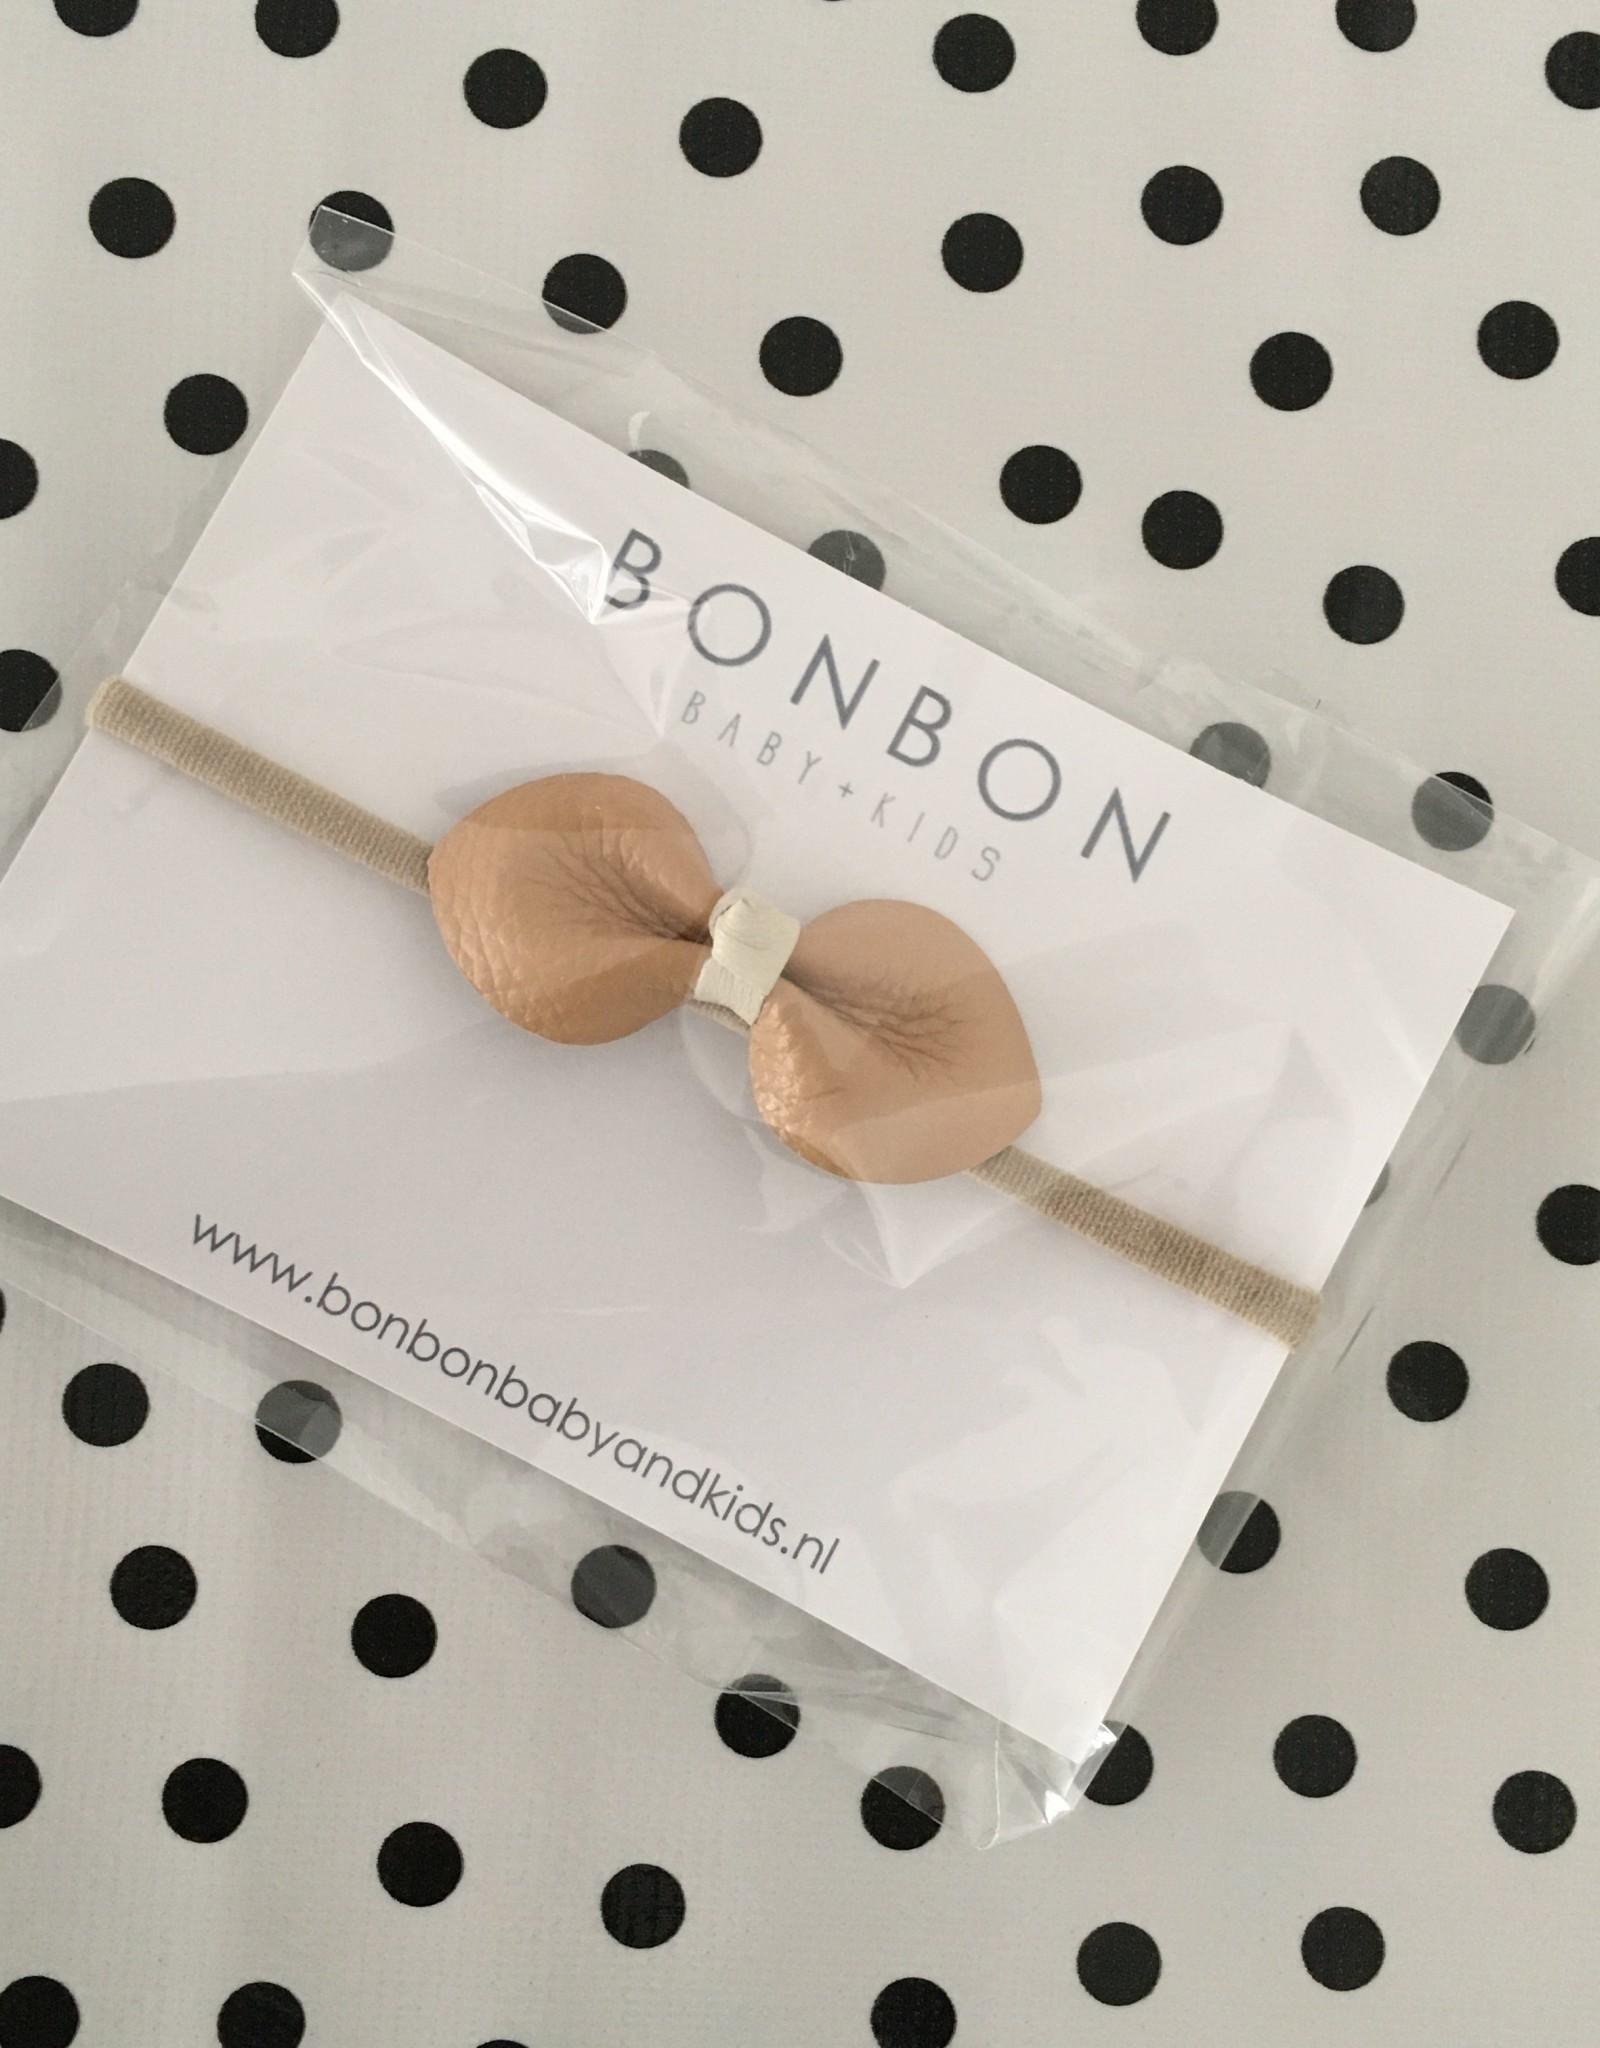 bonbon Bon bon haarband met strik leer beige en ecru